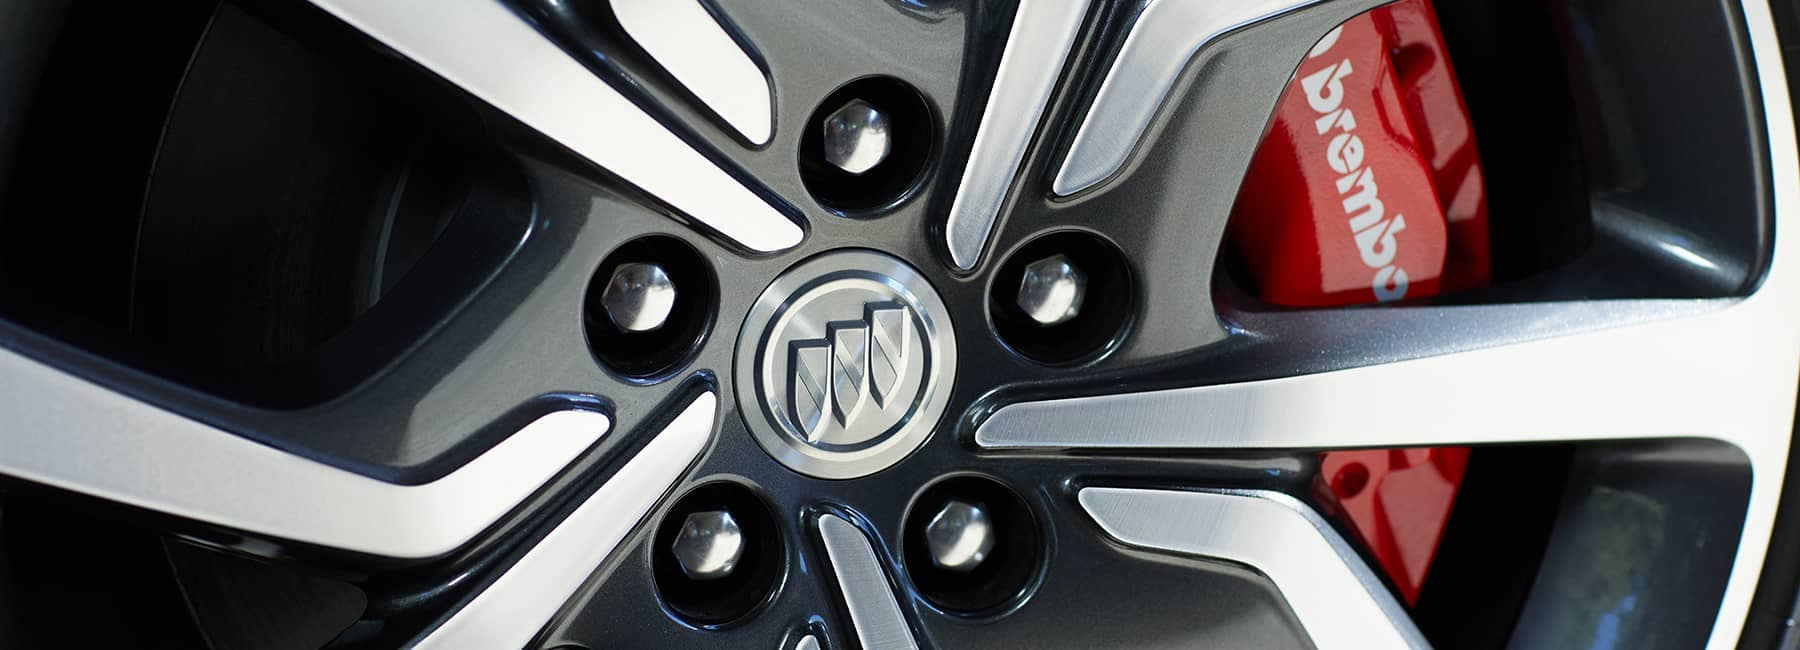 Buick_Logo_Rim